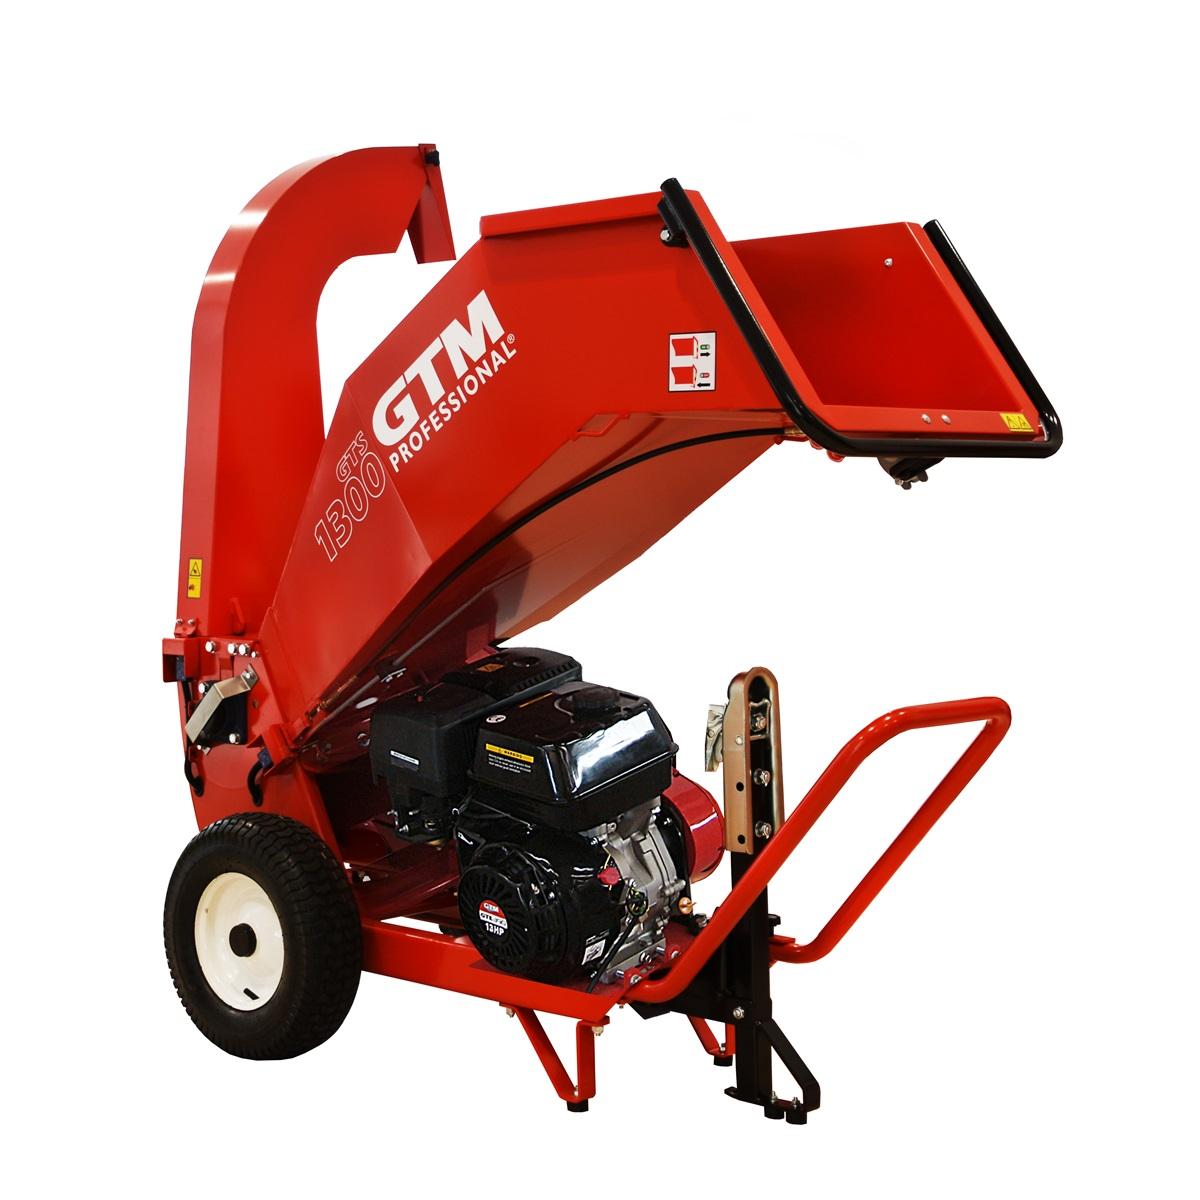 GTM GTS 1300G